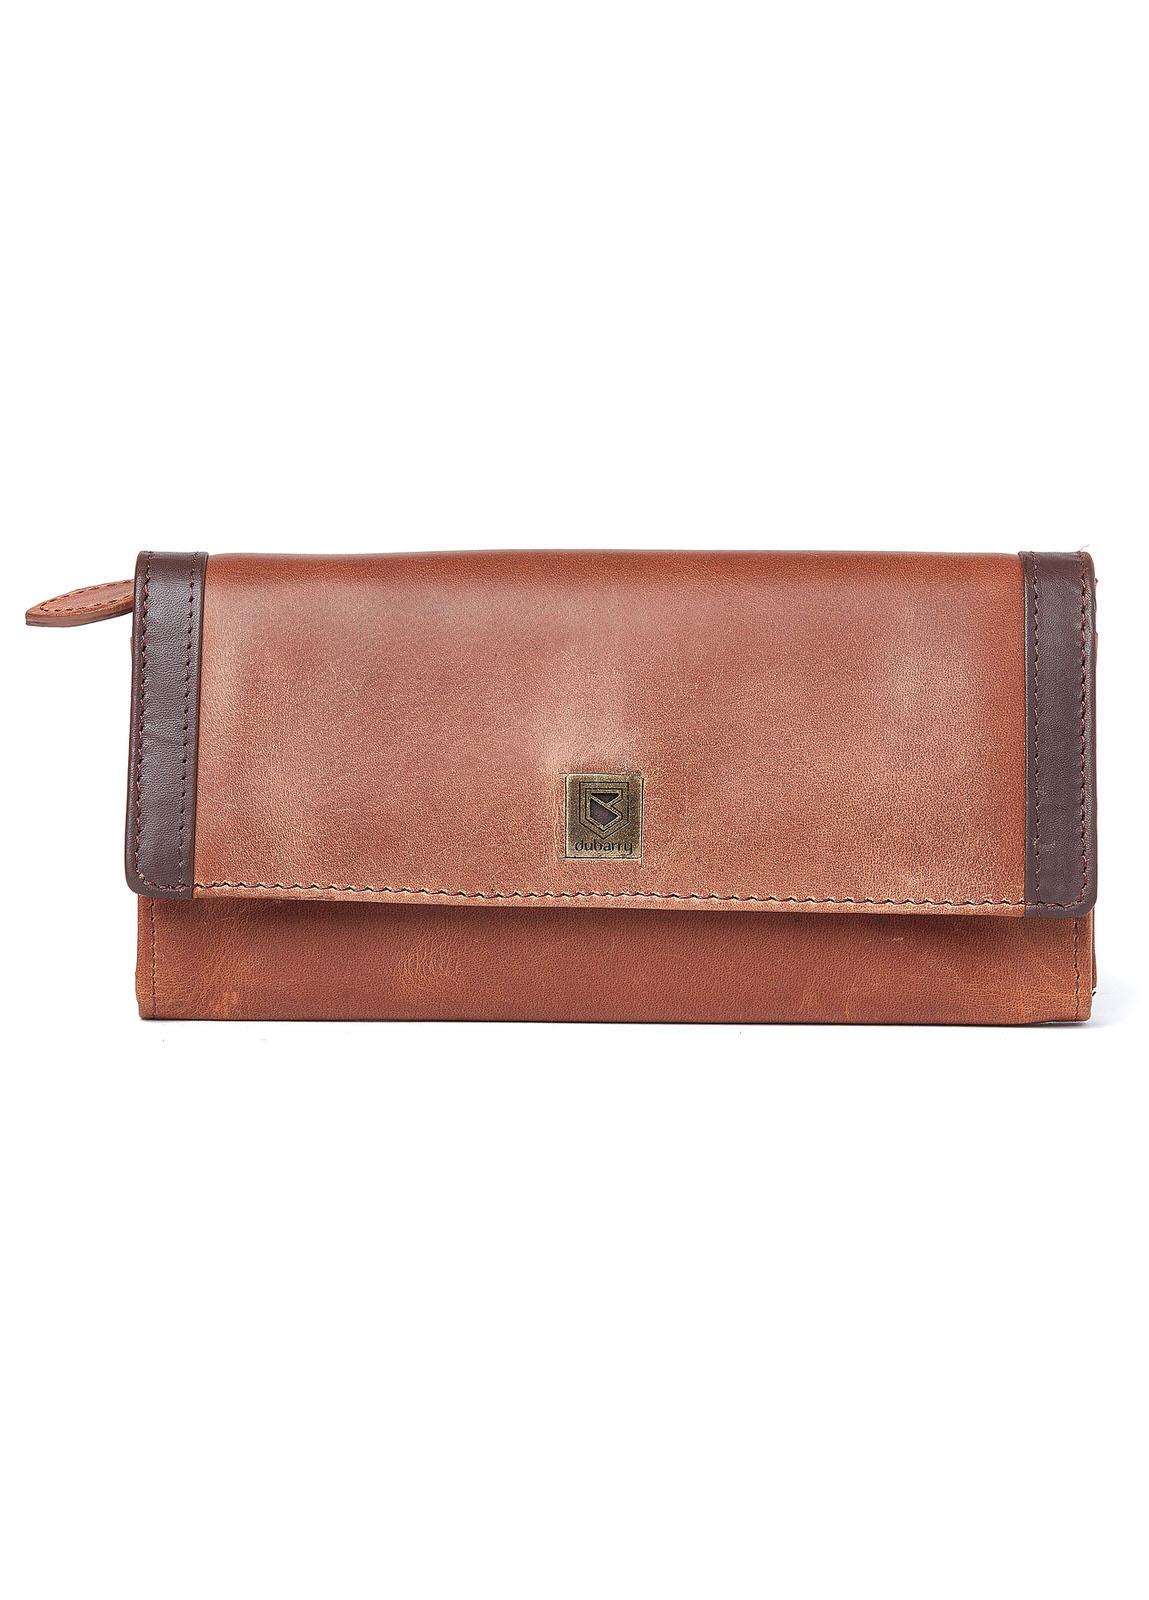 Collinstown_Leather_Wallet_Chestnut_Image_1